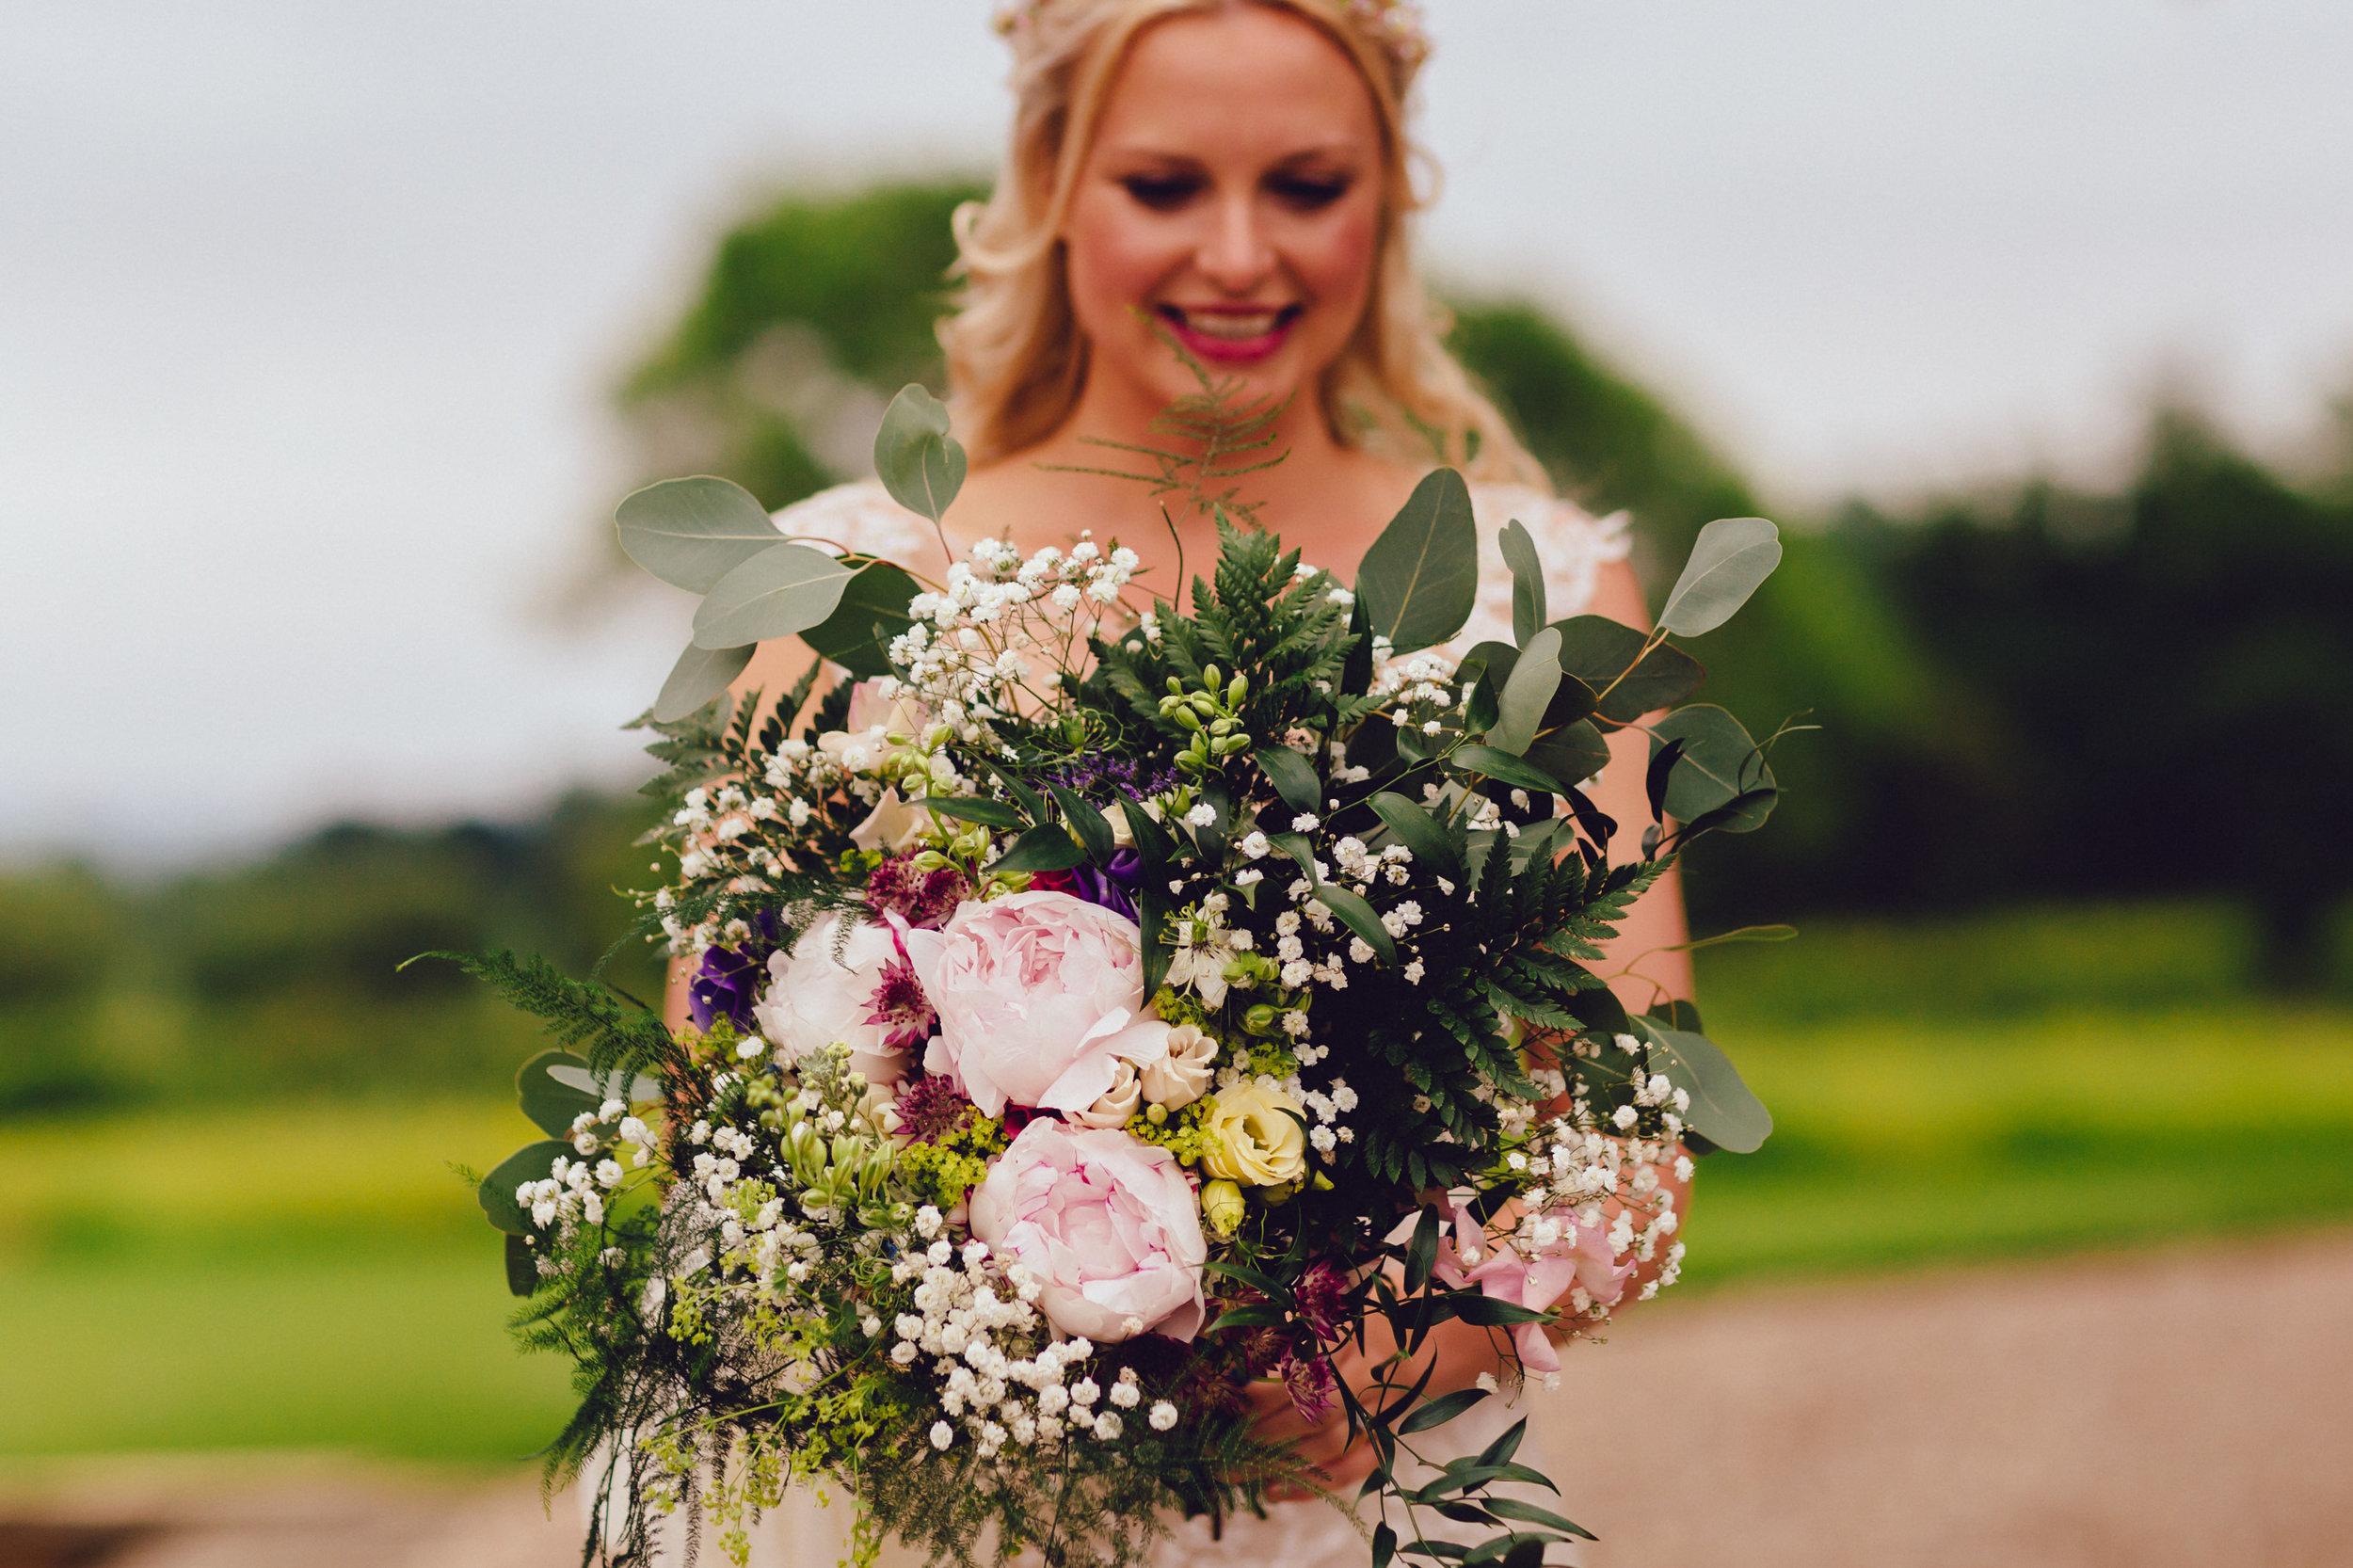 Birmingham photographer wedding country artistic wedding photography bride04.jpg